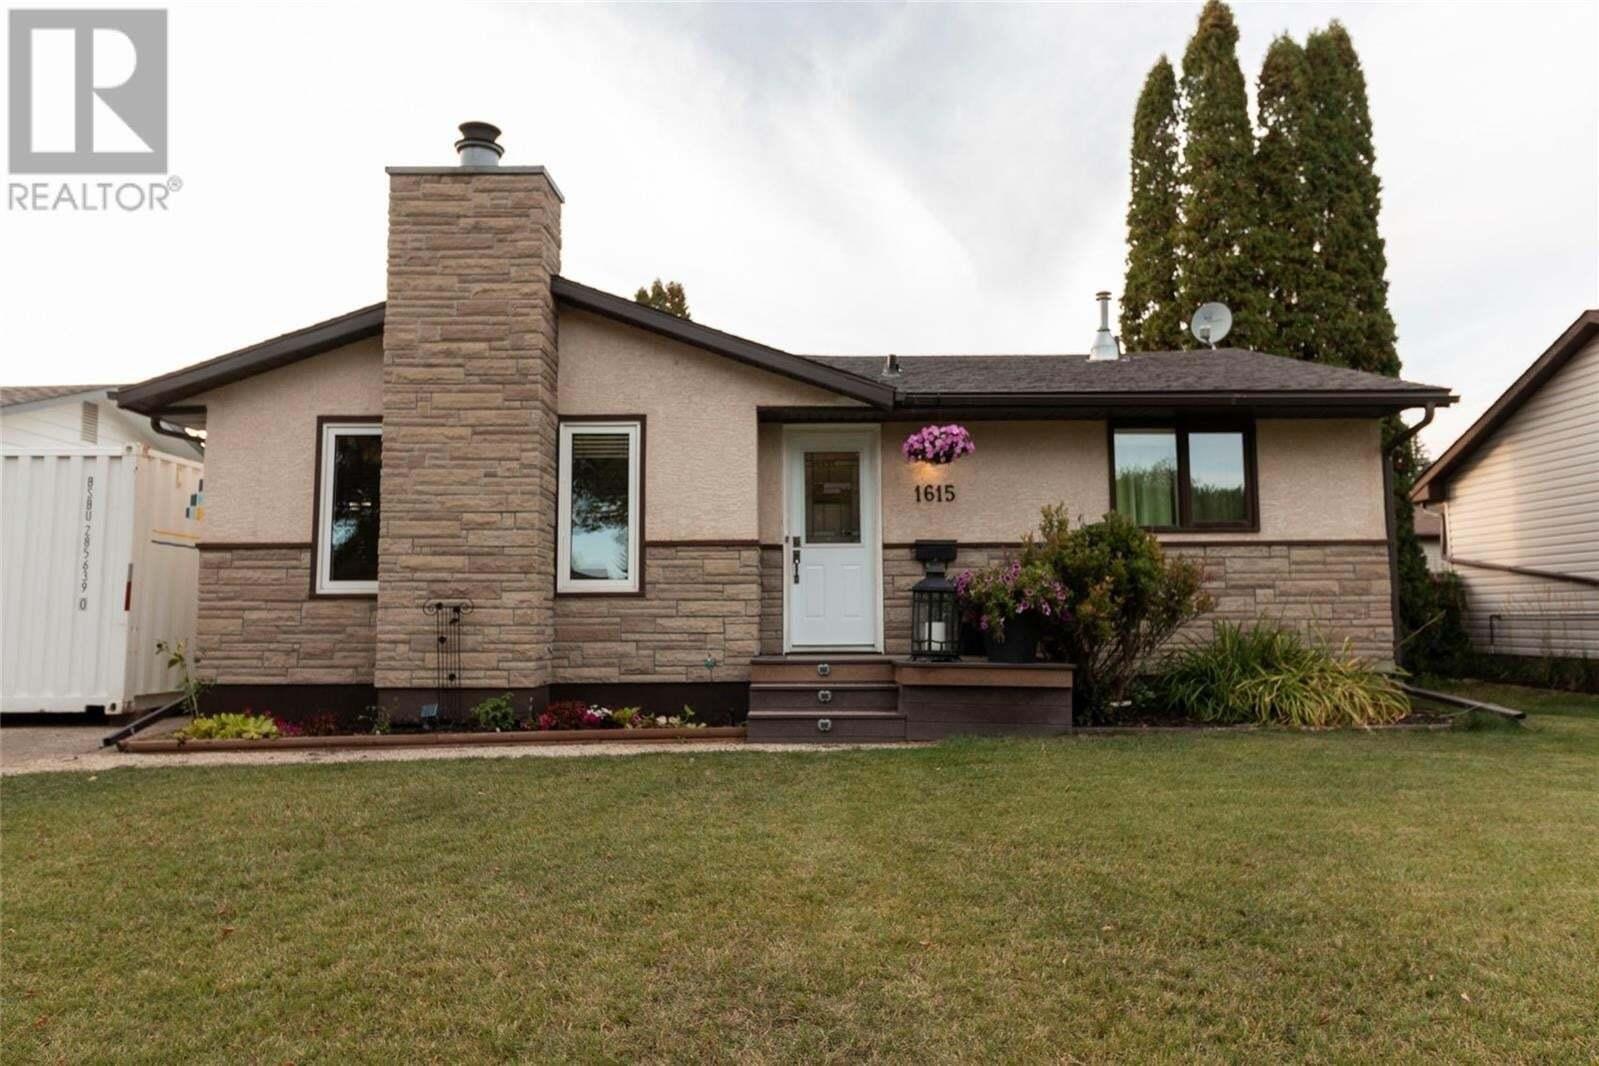 House for sale at 1615 8th Ave N Saskatoon Saskatchewan - MLS: SK827632